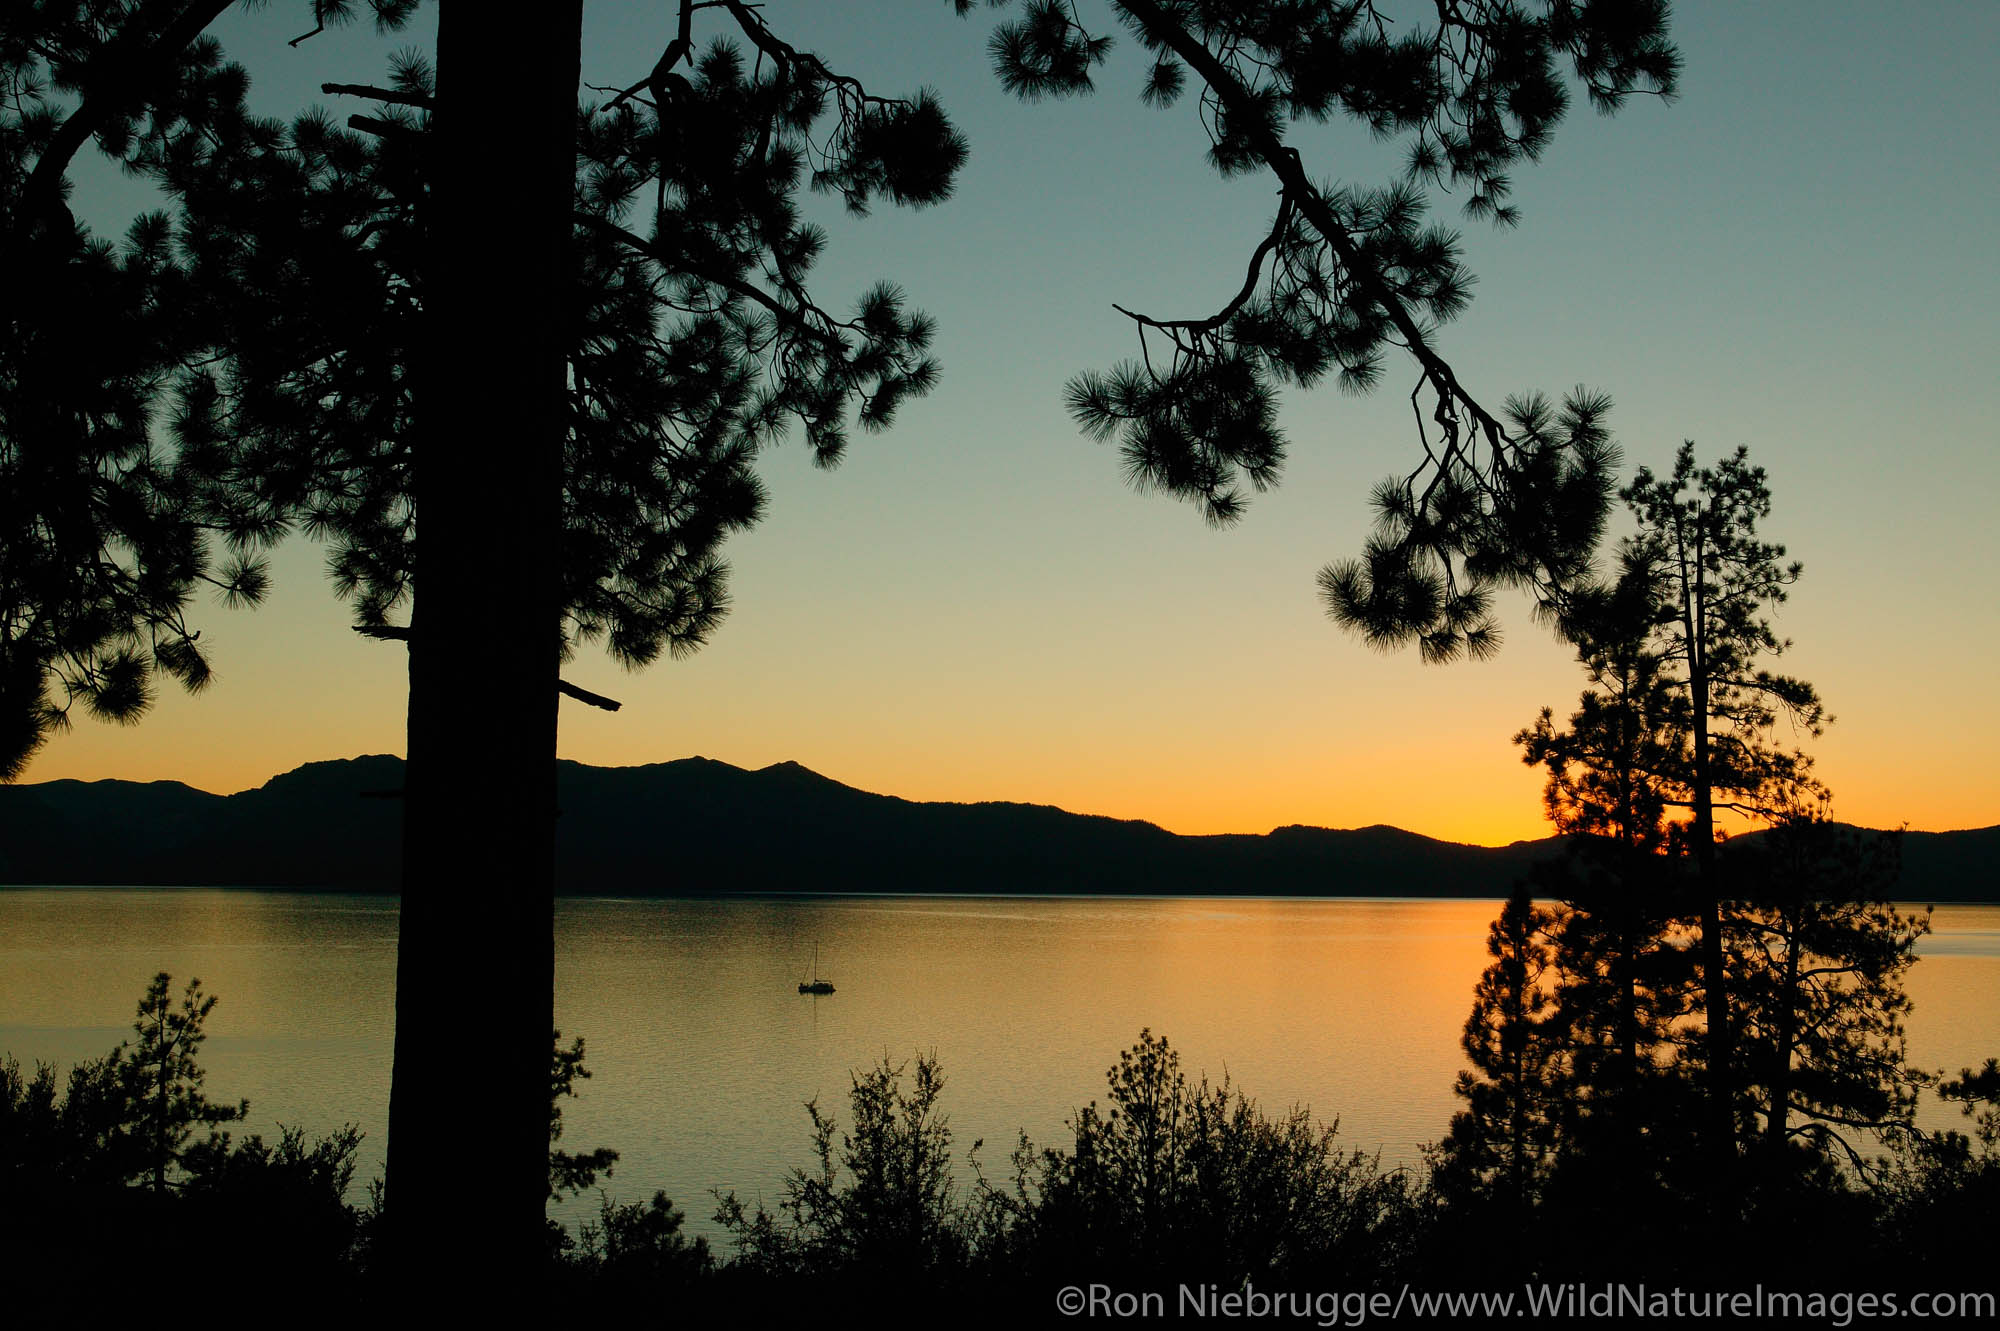 Sailboat on Lake Tahoe at sunset, from Nevada looking towards California.